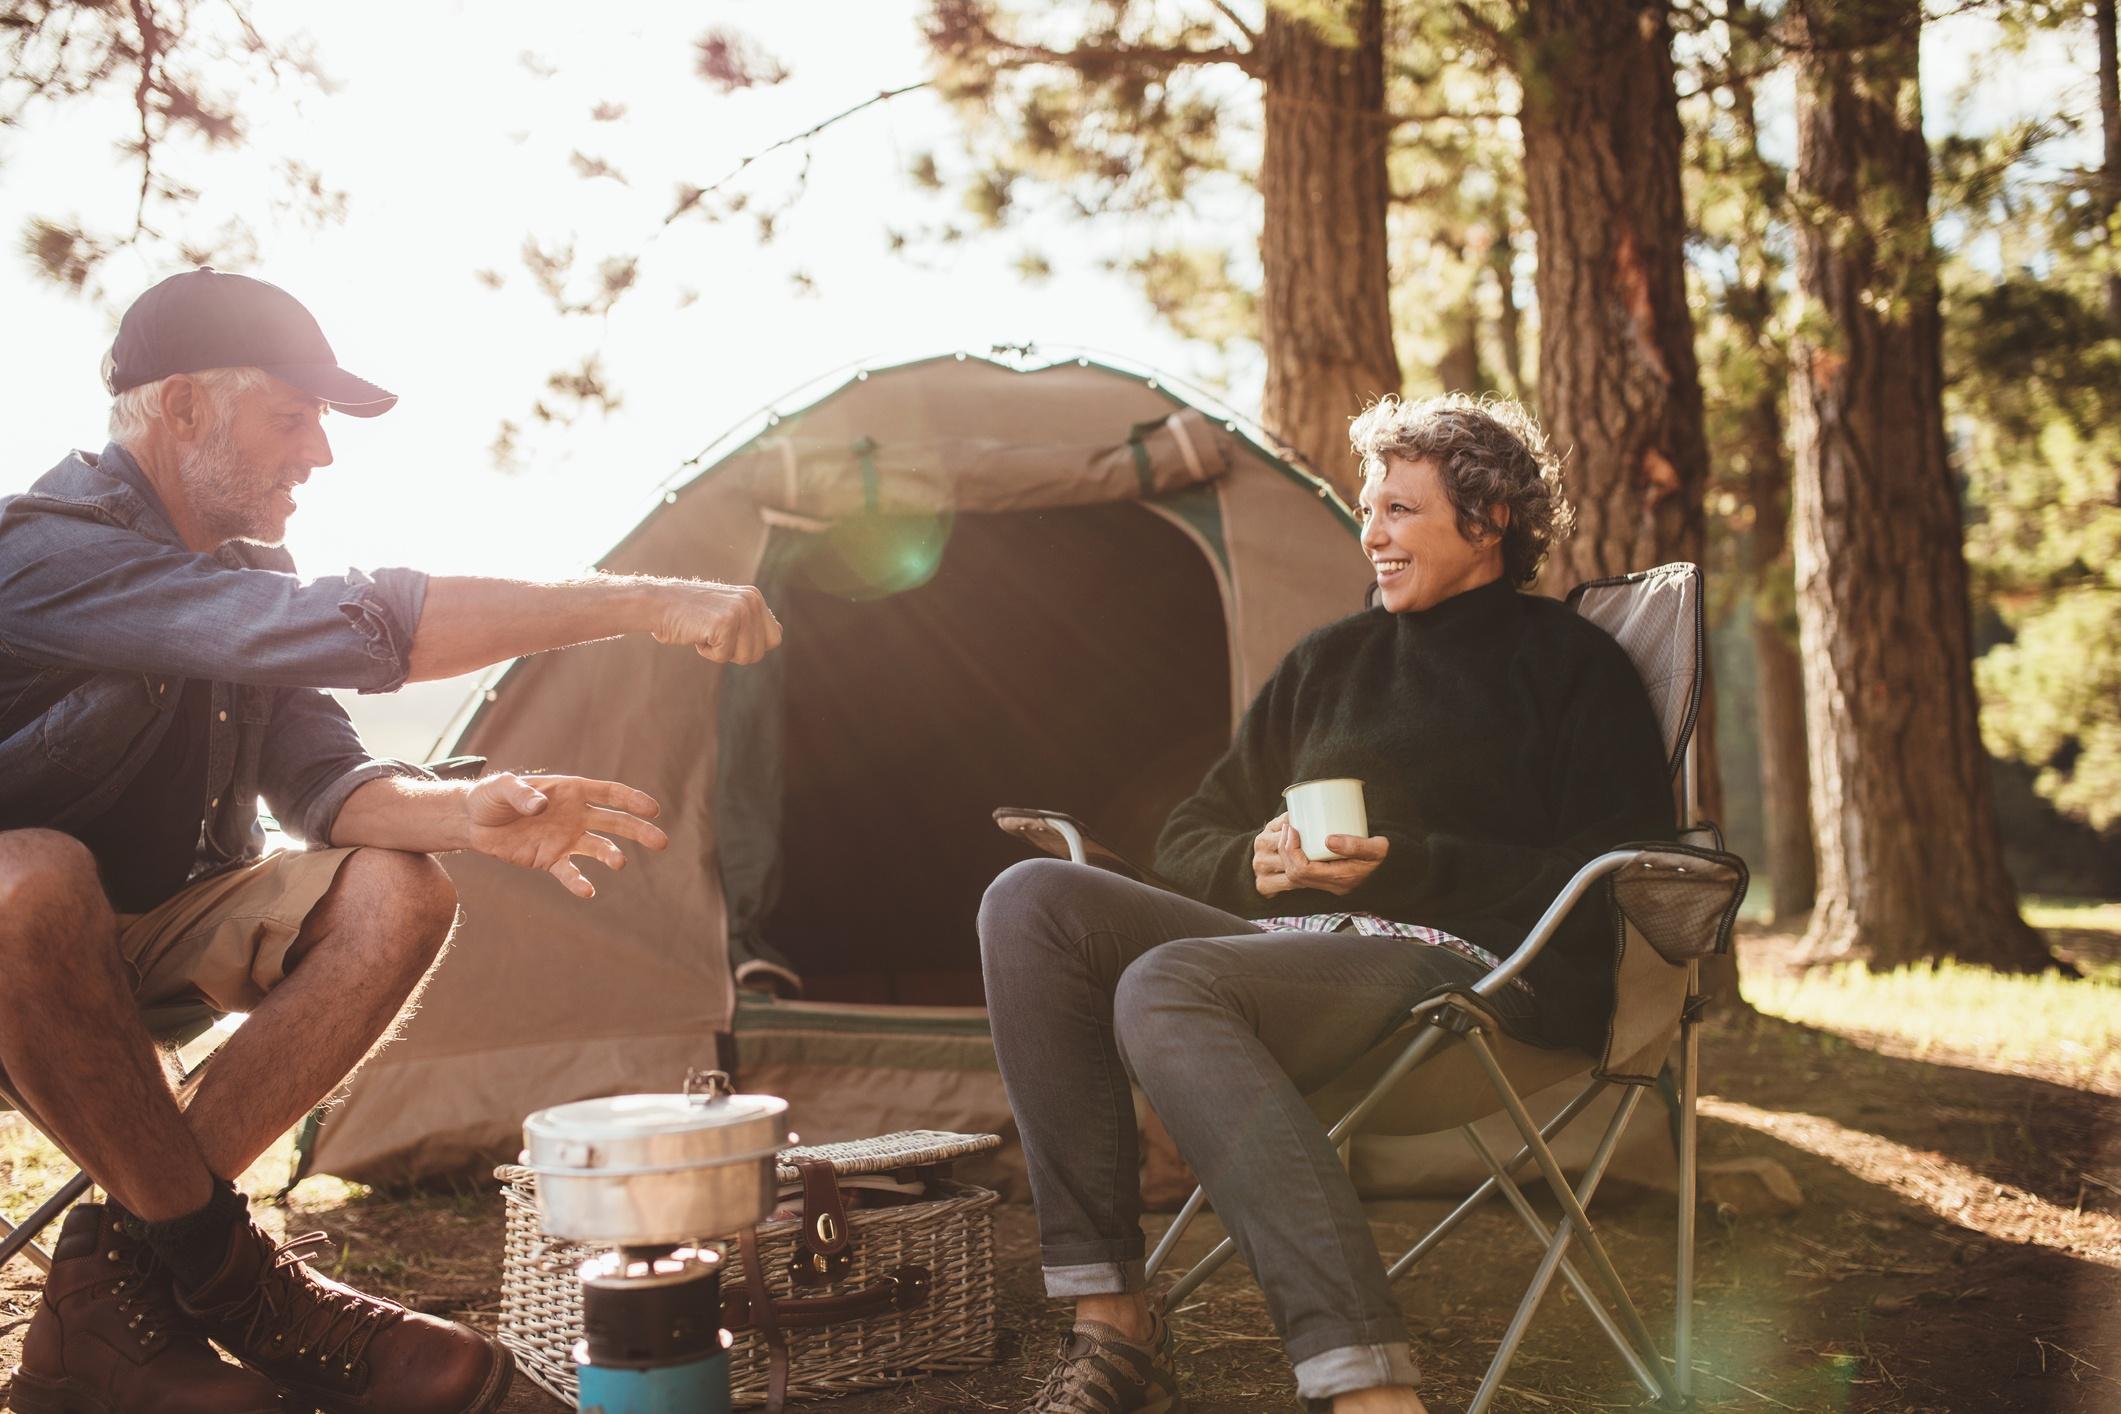 camping ThinkstockPhotos-510069520.jpg